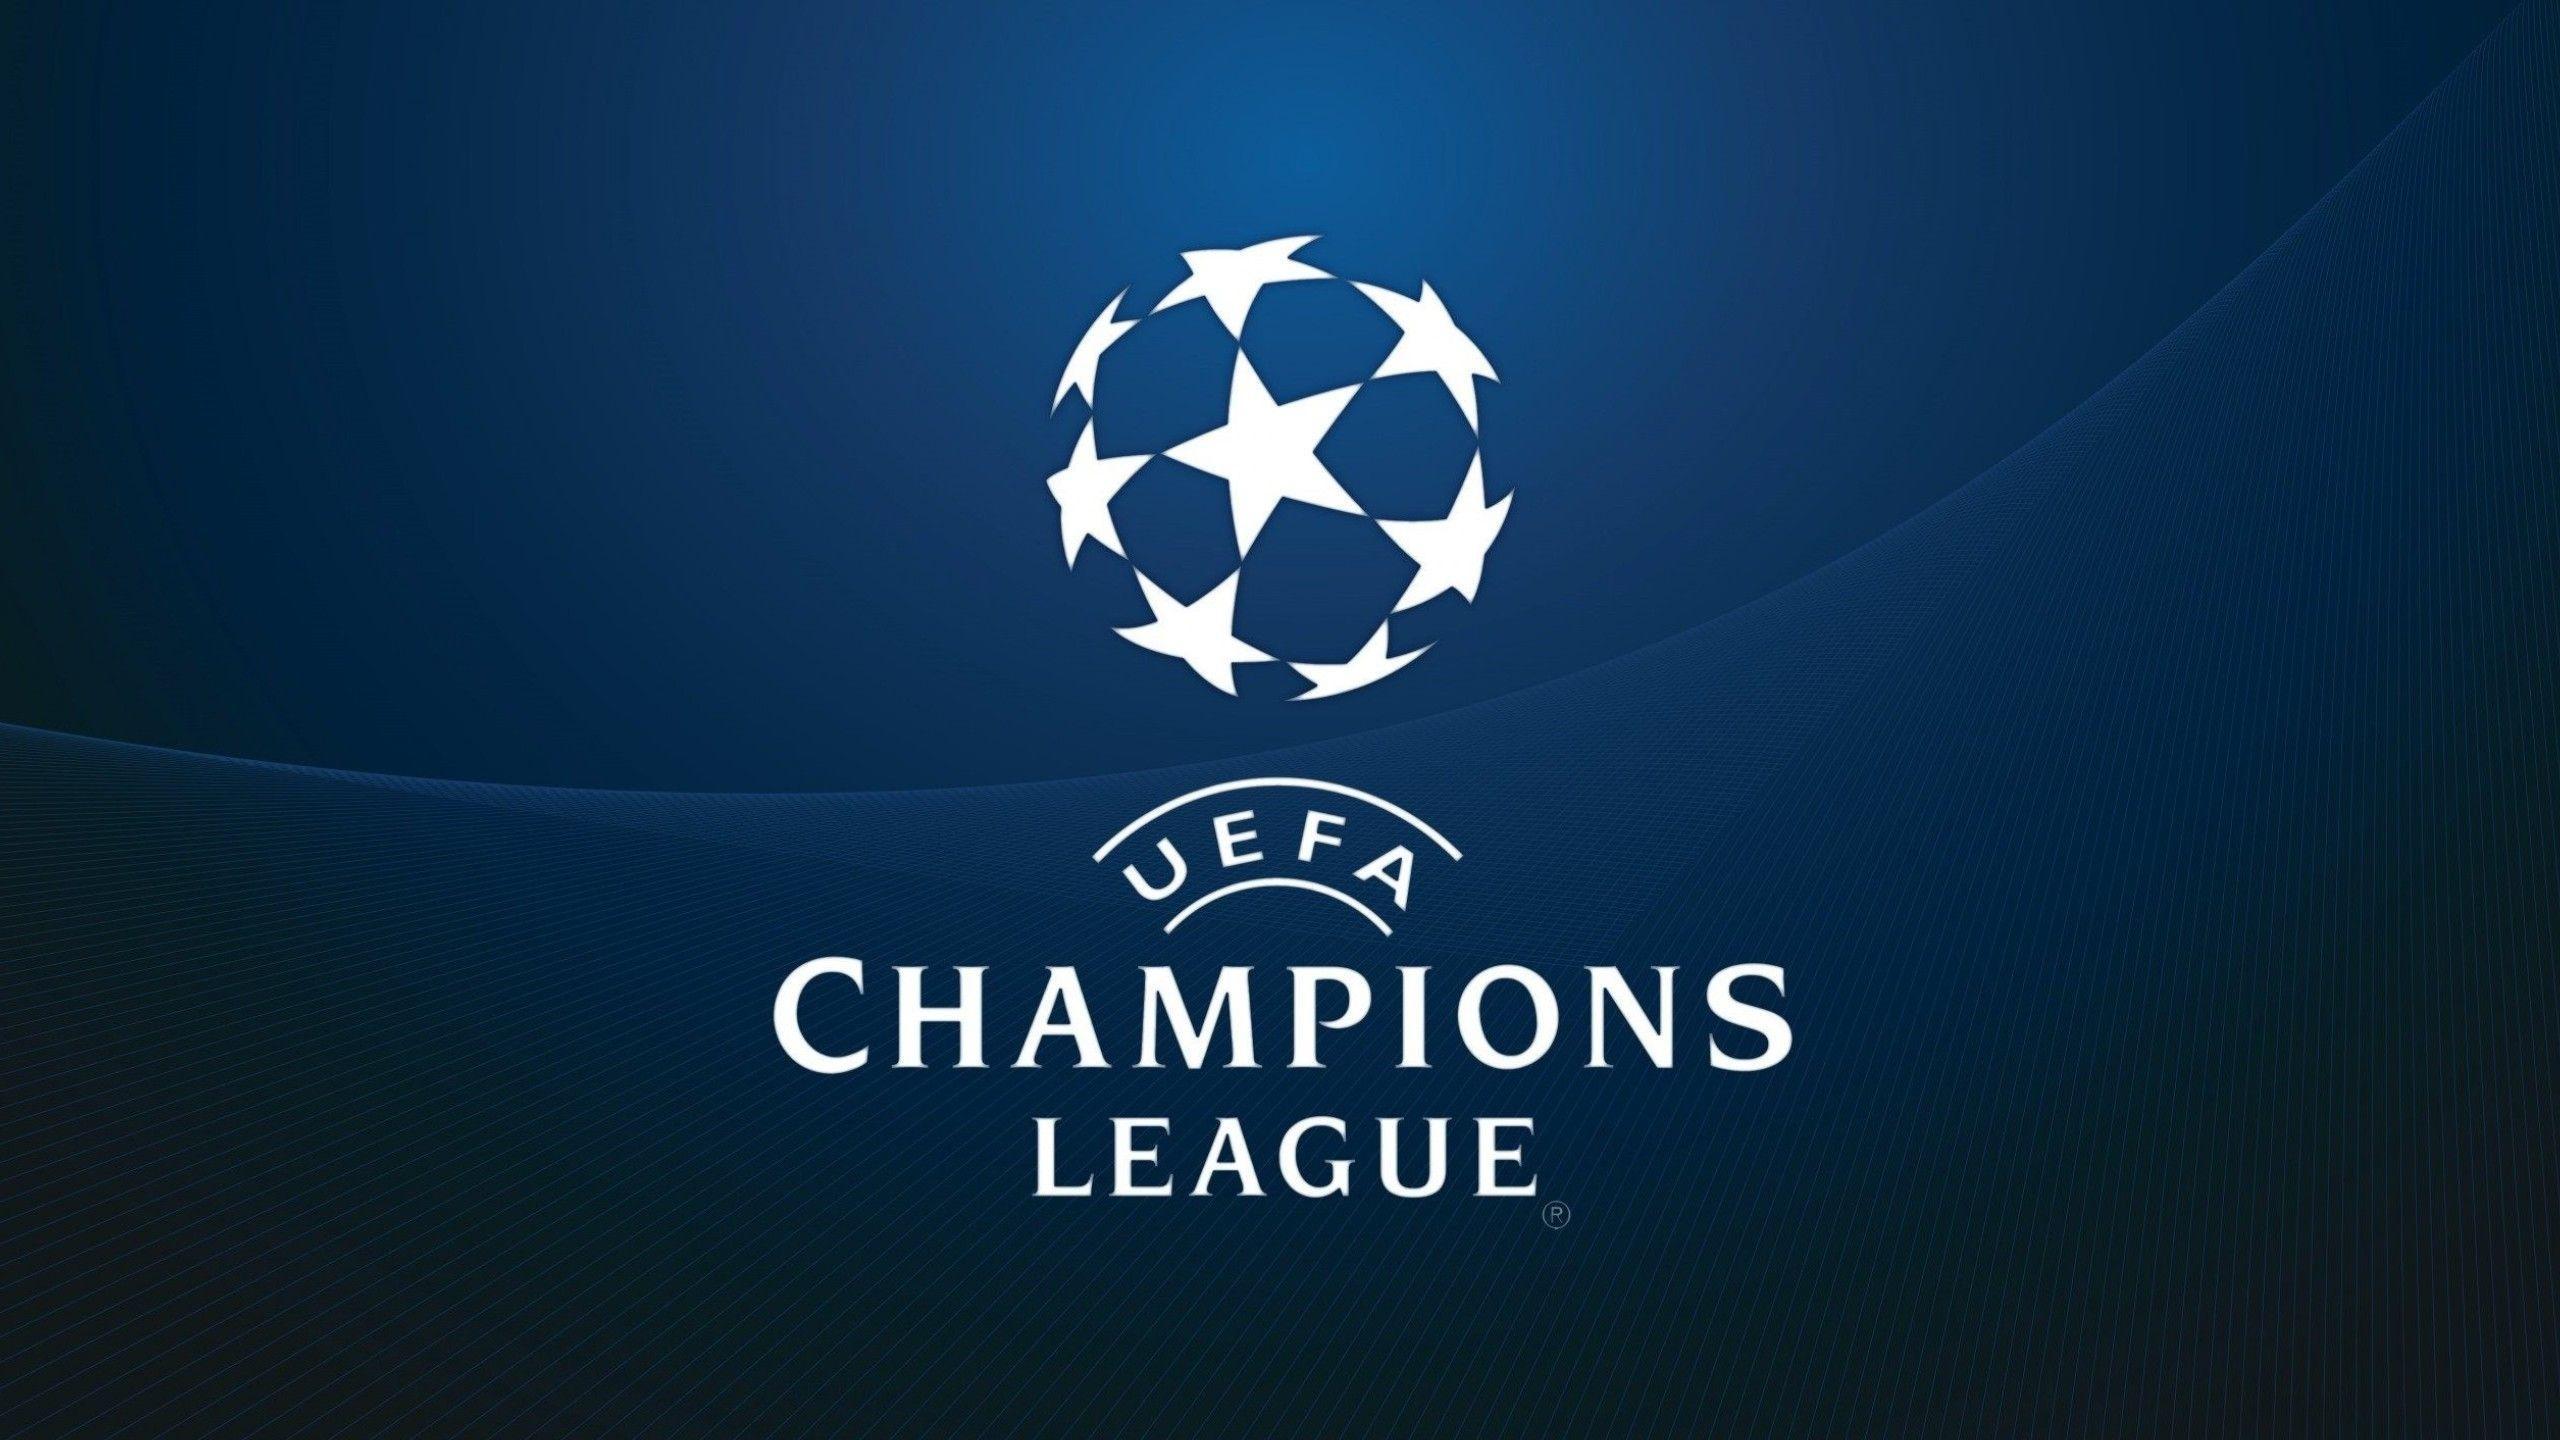 champions league uefa wallpapers wallpaper cave champions league uefa wallpapers